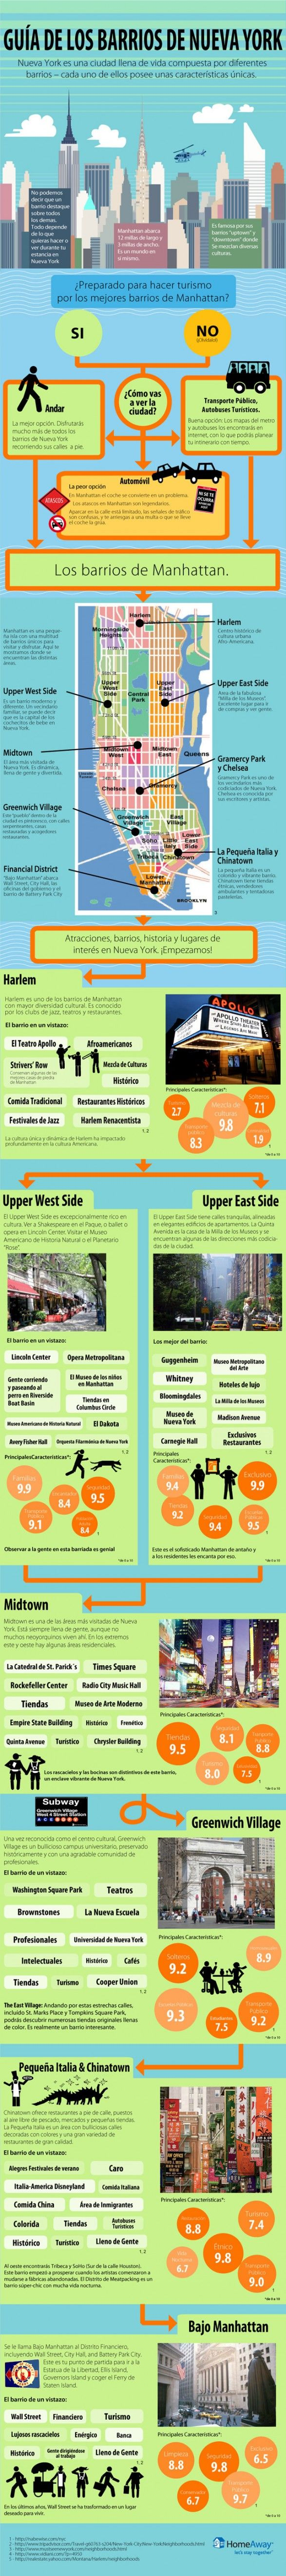 Guía de barrios de Nueva York #infografia